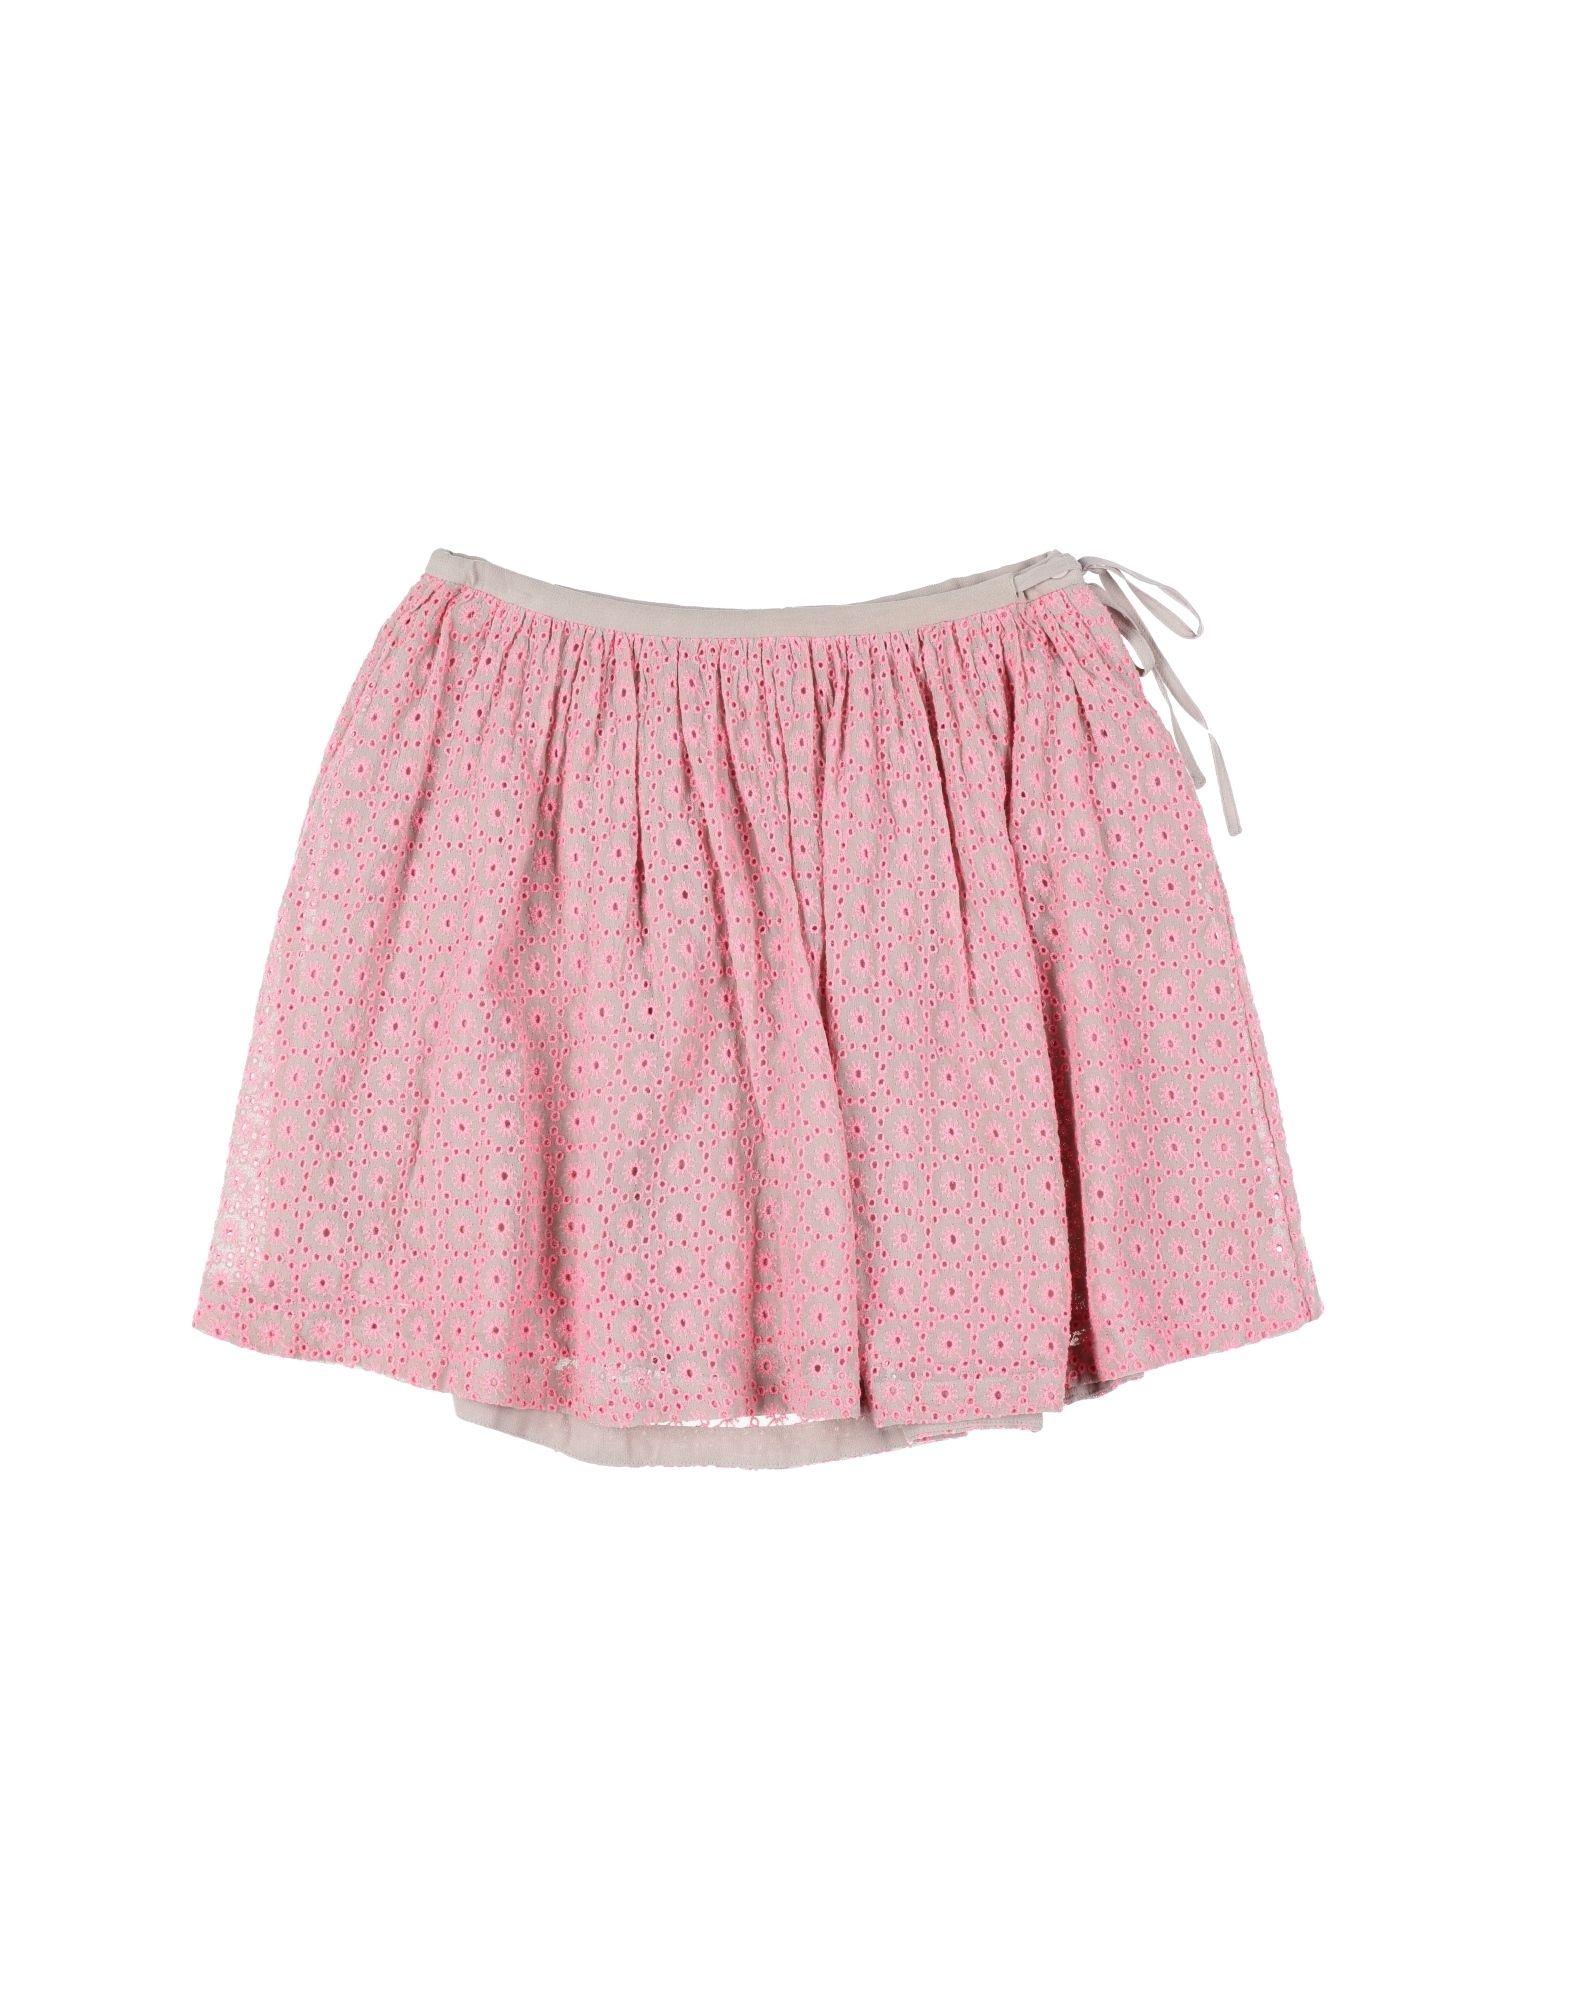 PREEN by THORNTON BREGAZZI Mädchen 9-16 jahre Rock Farbe Rosa Größe 2